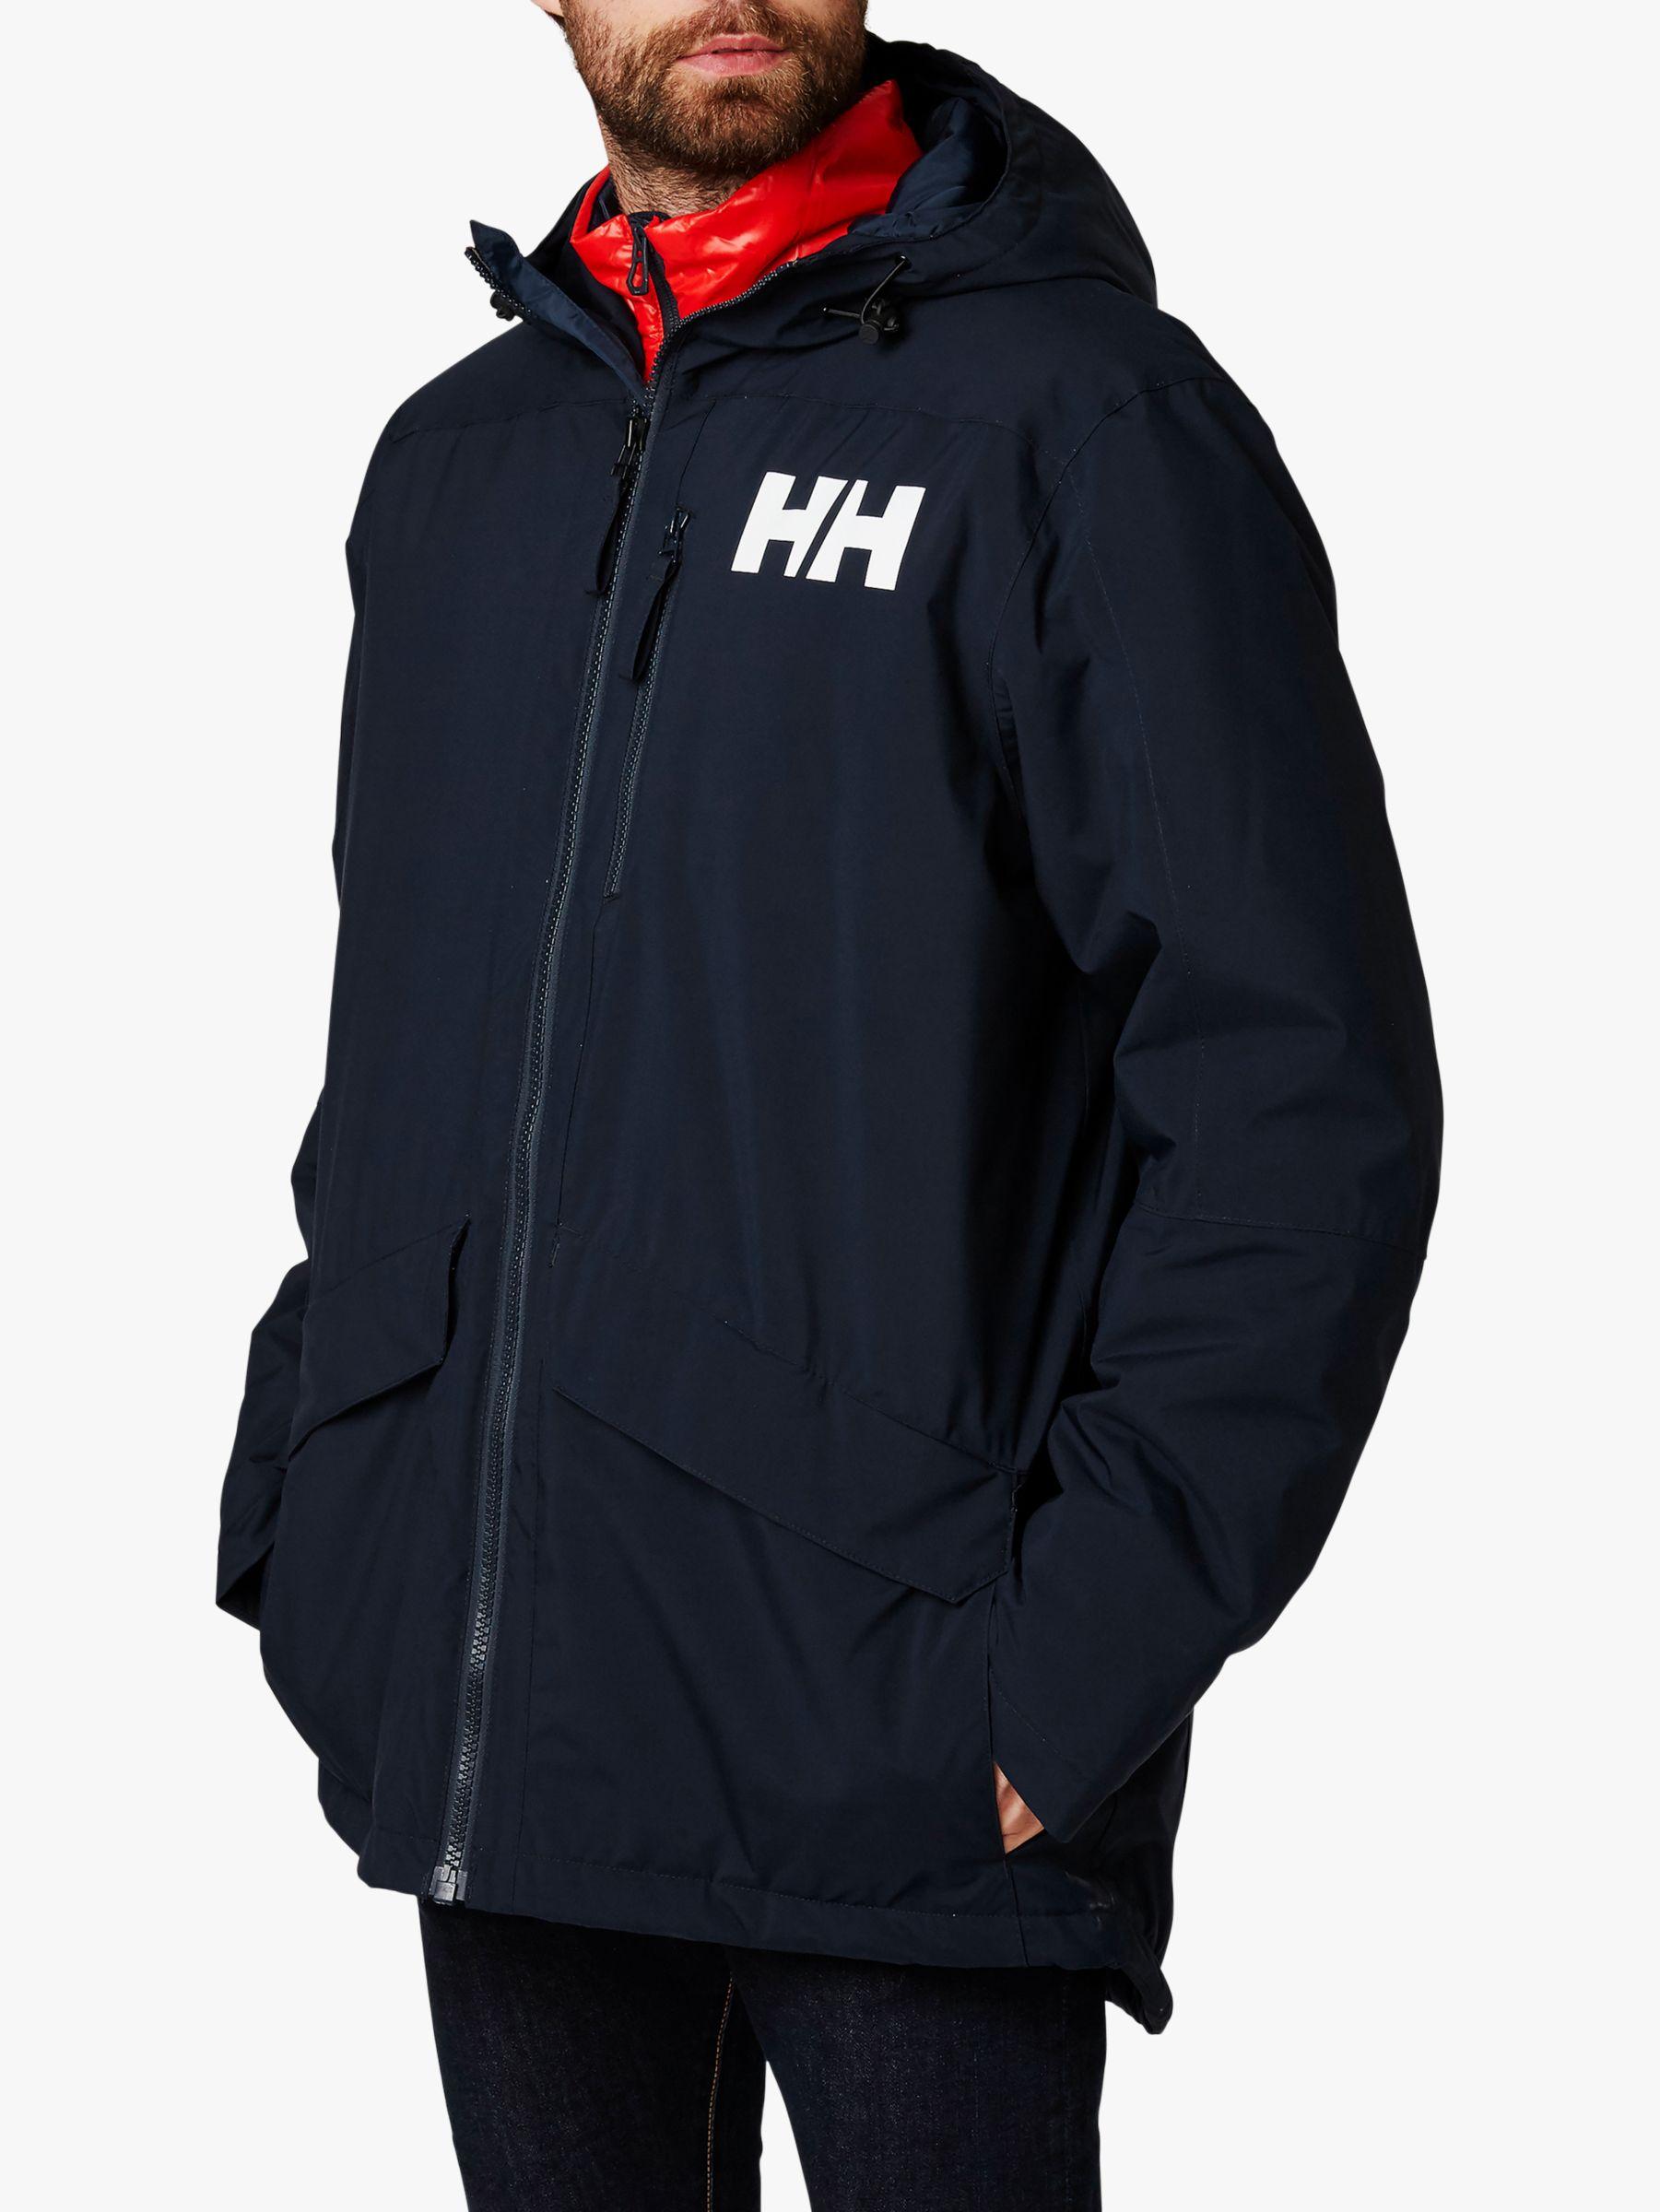 Helly Hansen Helly Hansen Active Fall 2.0 Men's Waterproof Parka Jacket, Navy